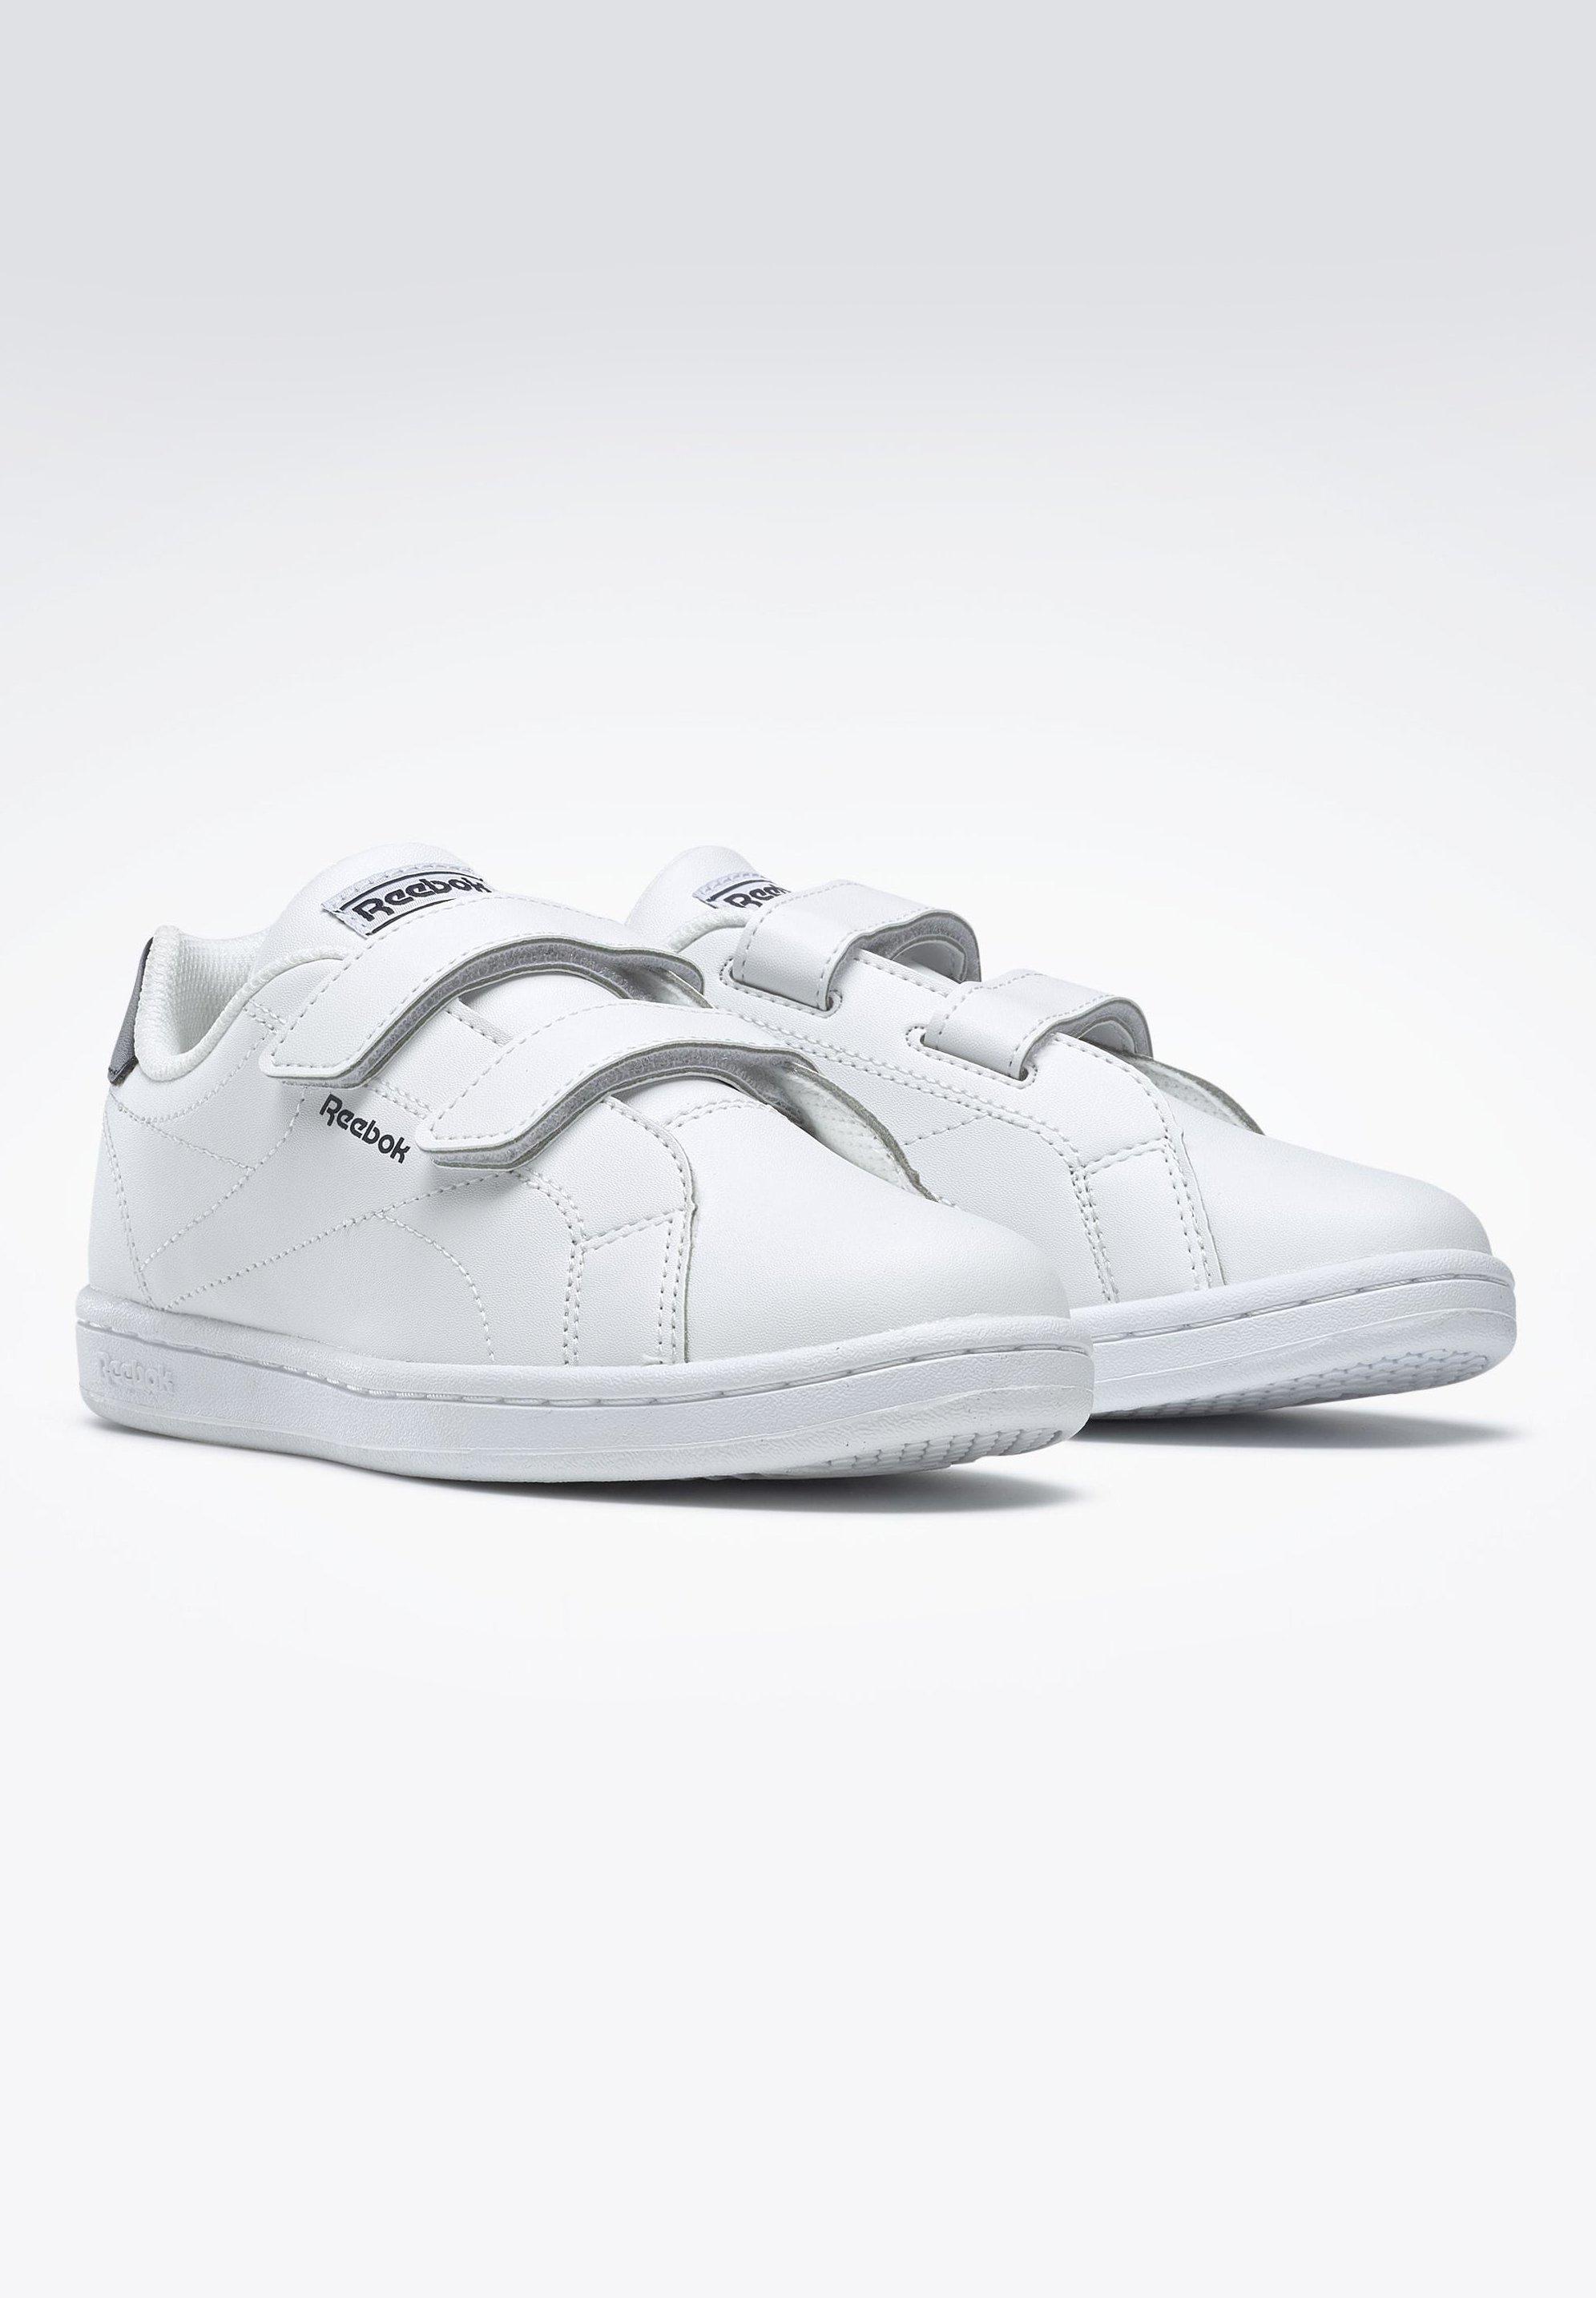 Reebok Royal Complete Clean 2.0 whitewhitewhite ab 37,95